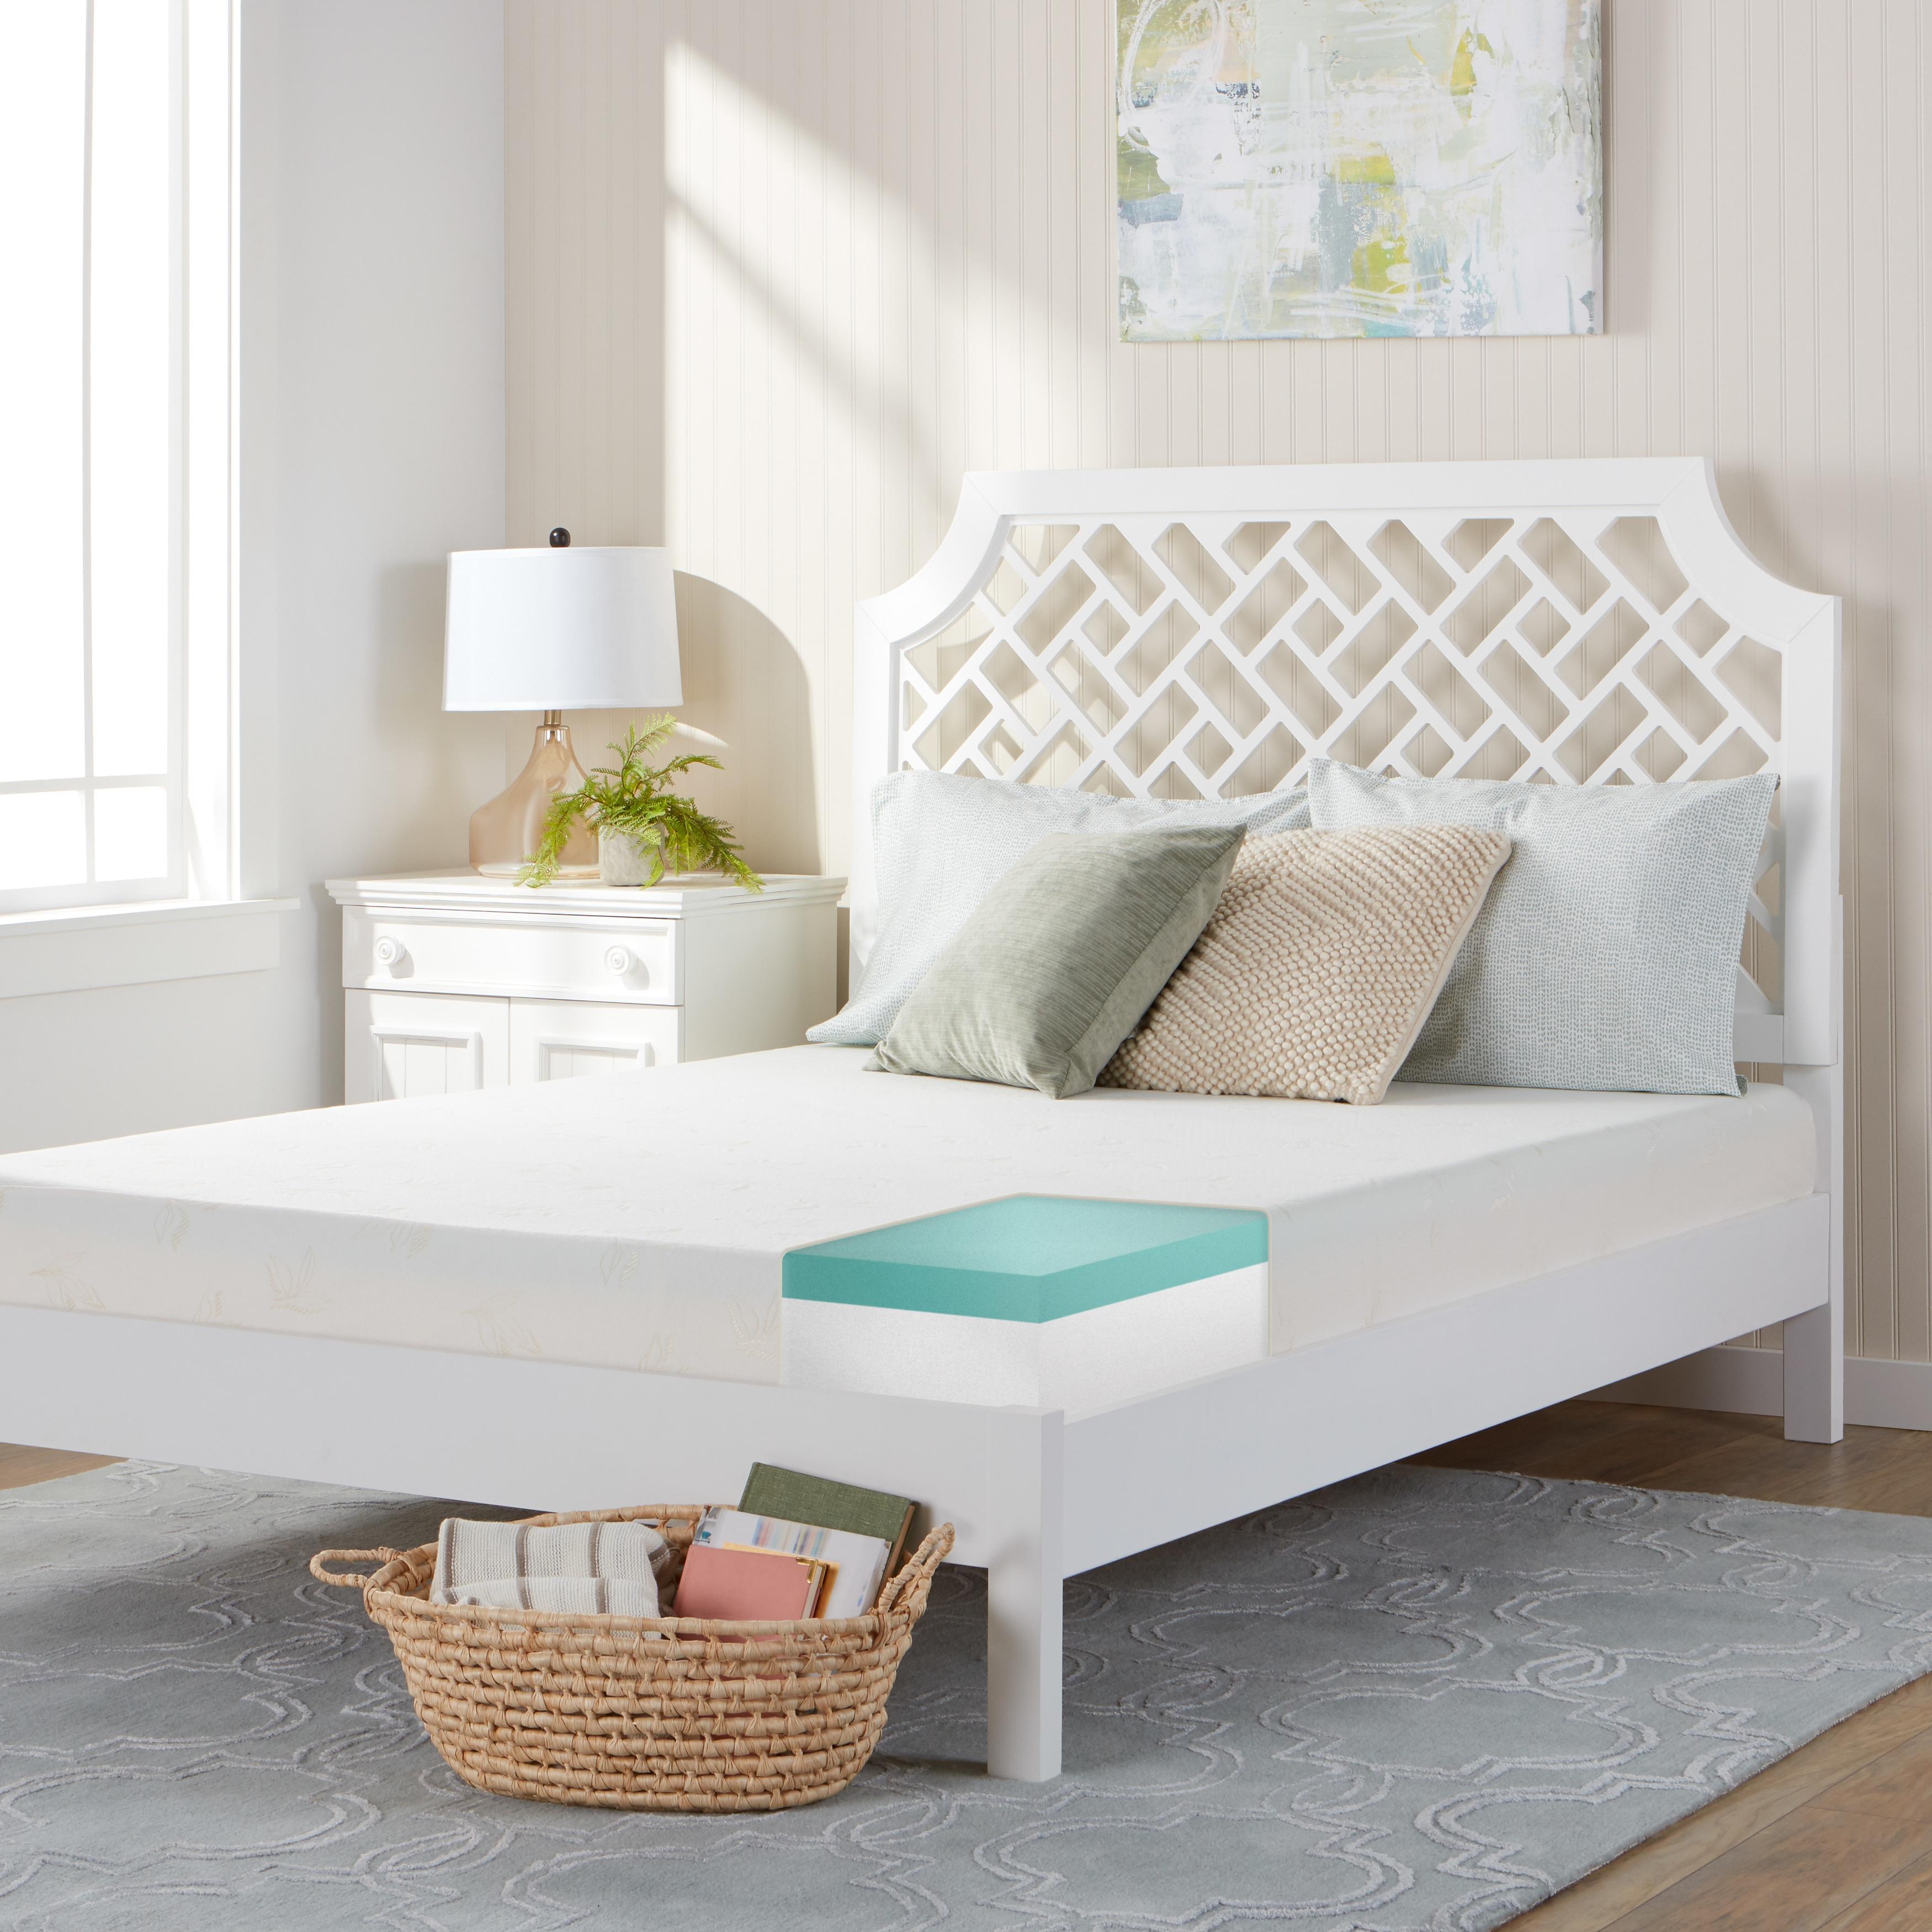 Comfort Dreams 8-inch Full-size Gel Foam Mattress (Full)